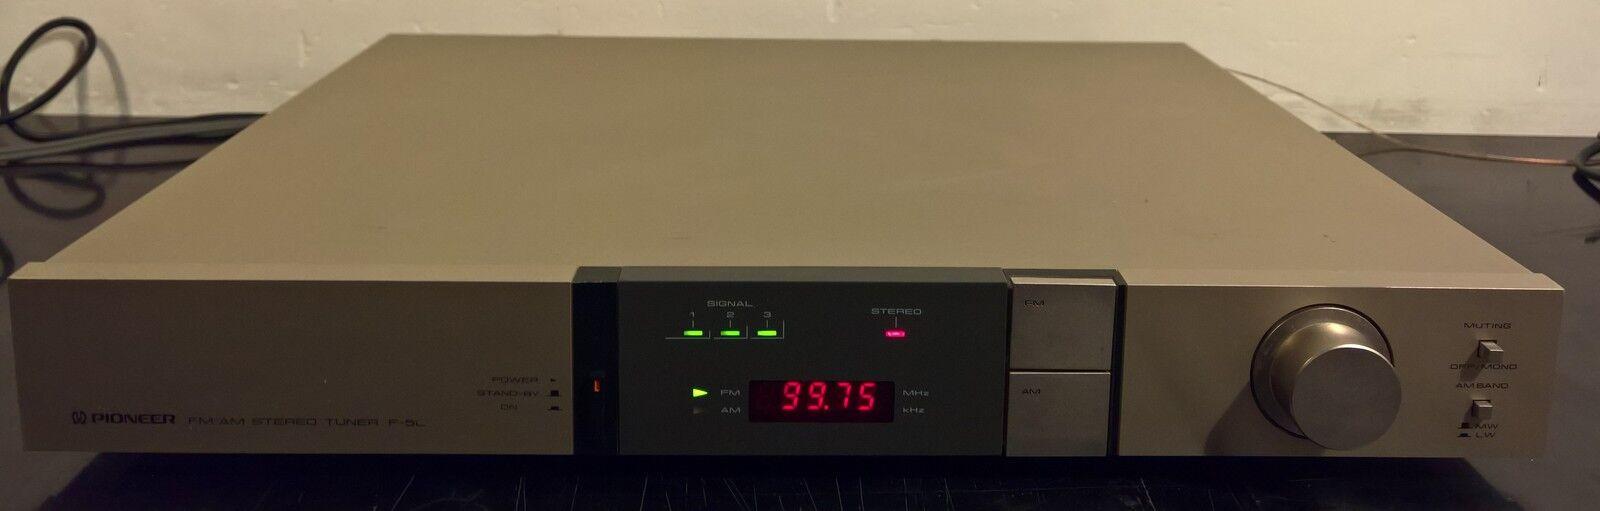 Sintonizzatore radio digitale FM/AM $_57